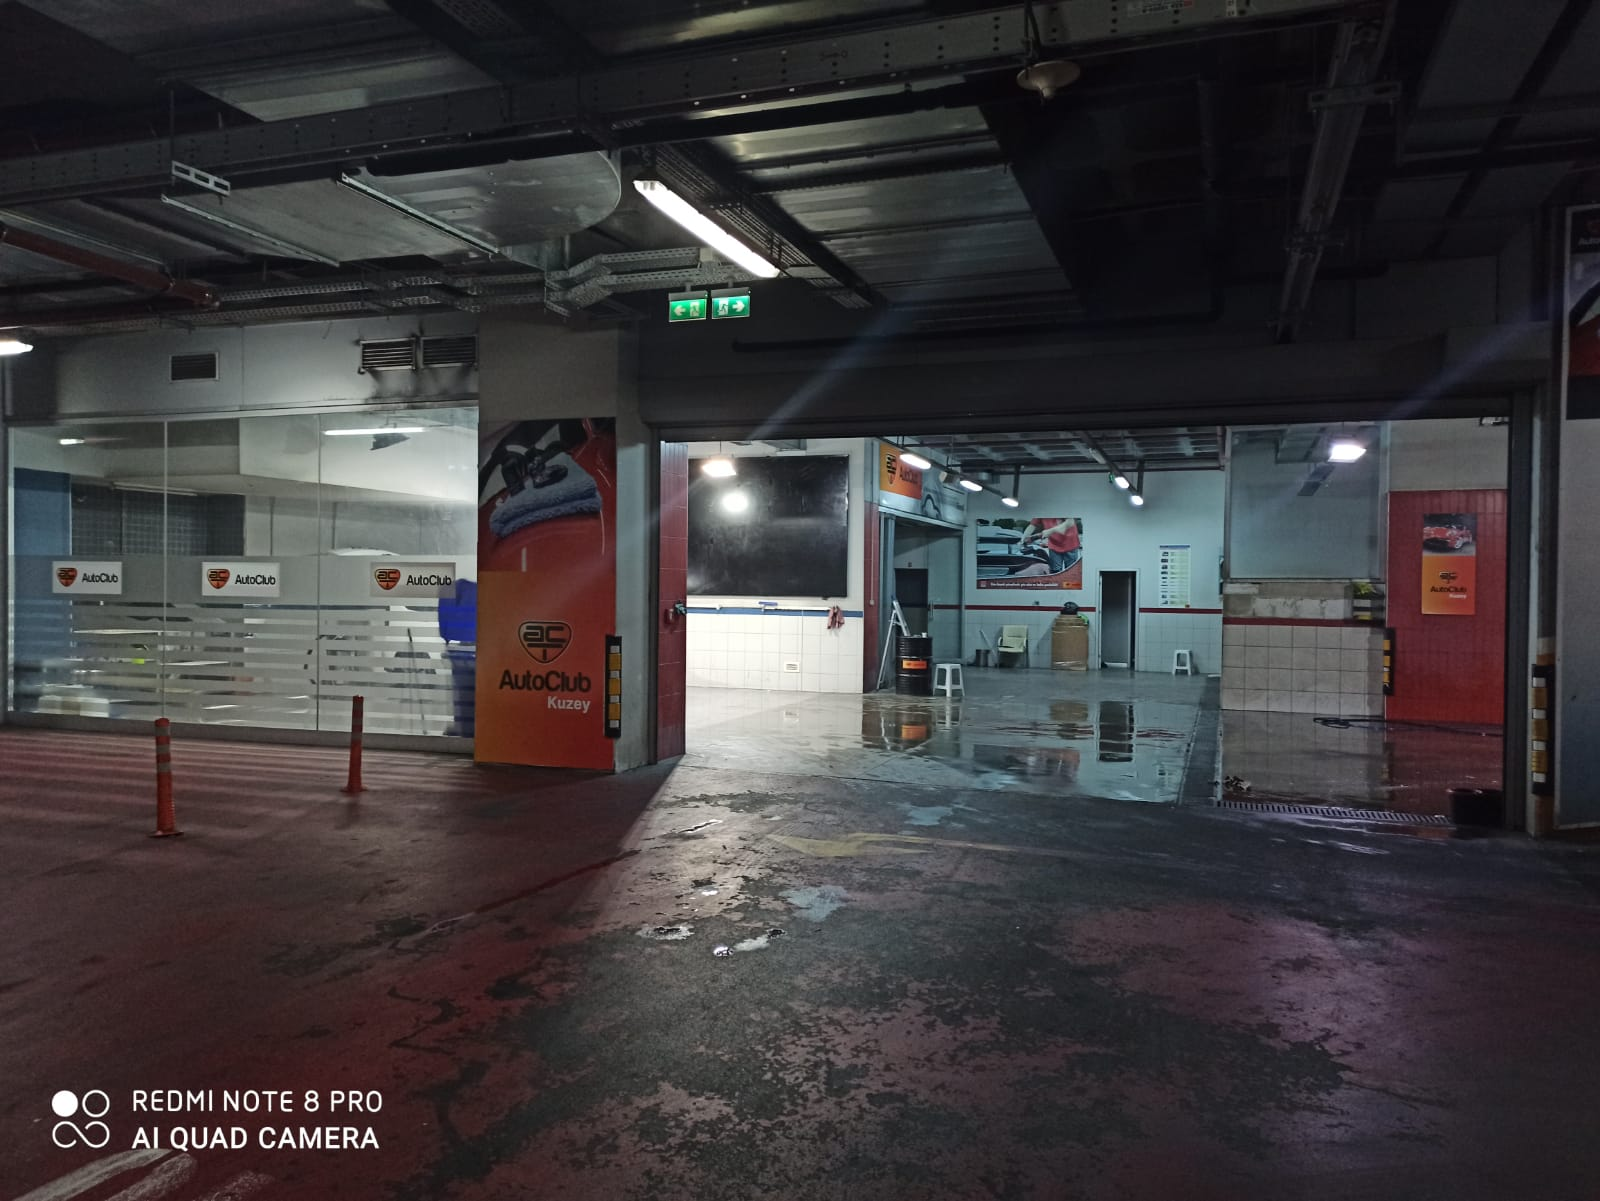 AutoClub Kuzey - İstanbul Güneşli